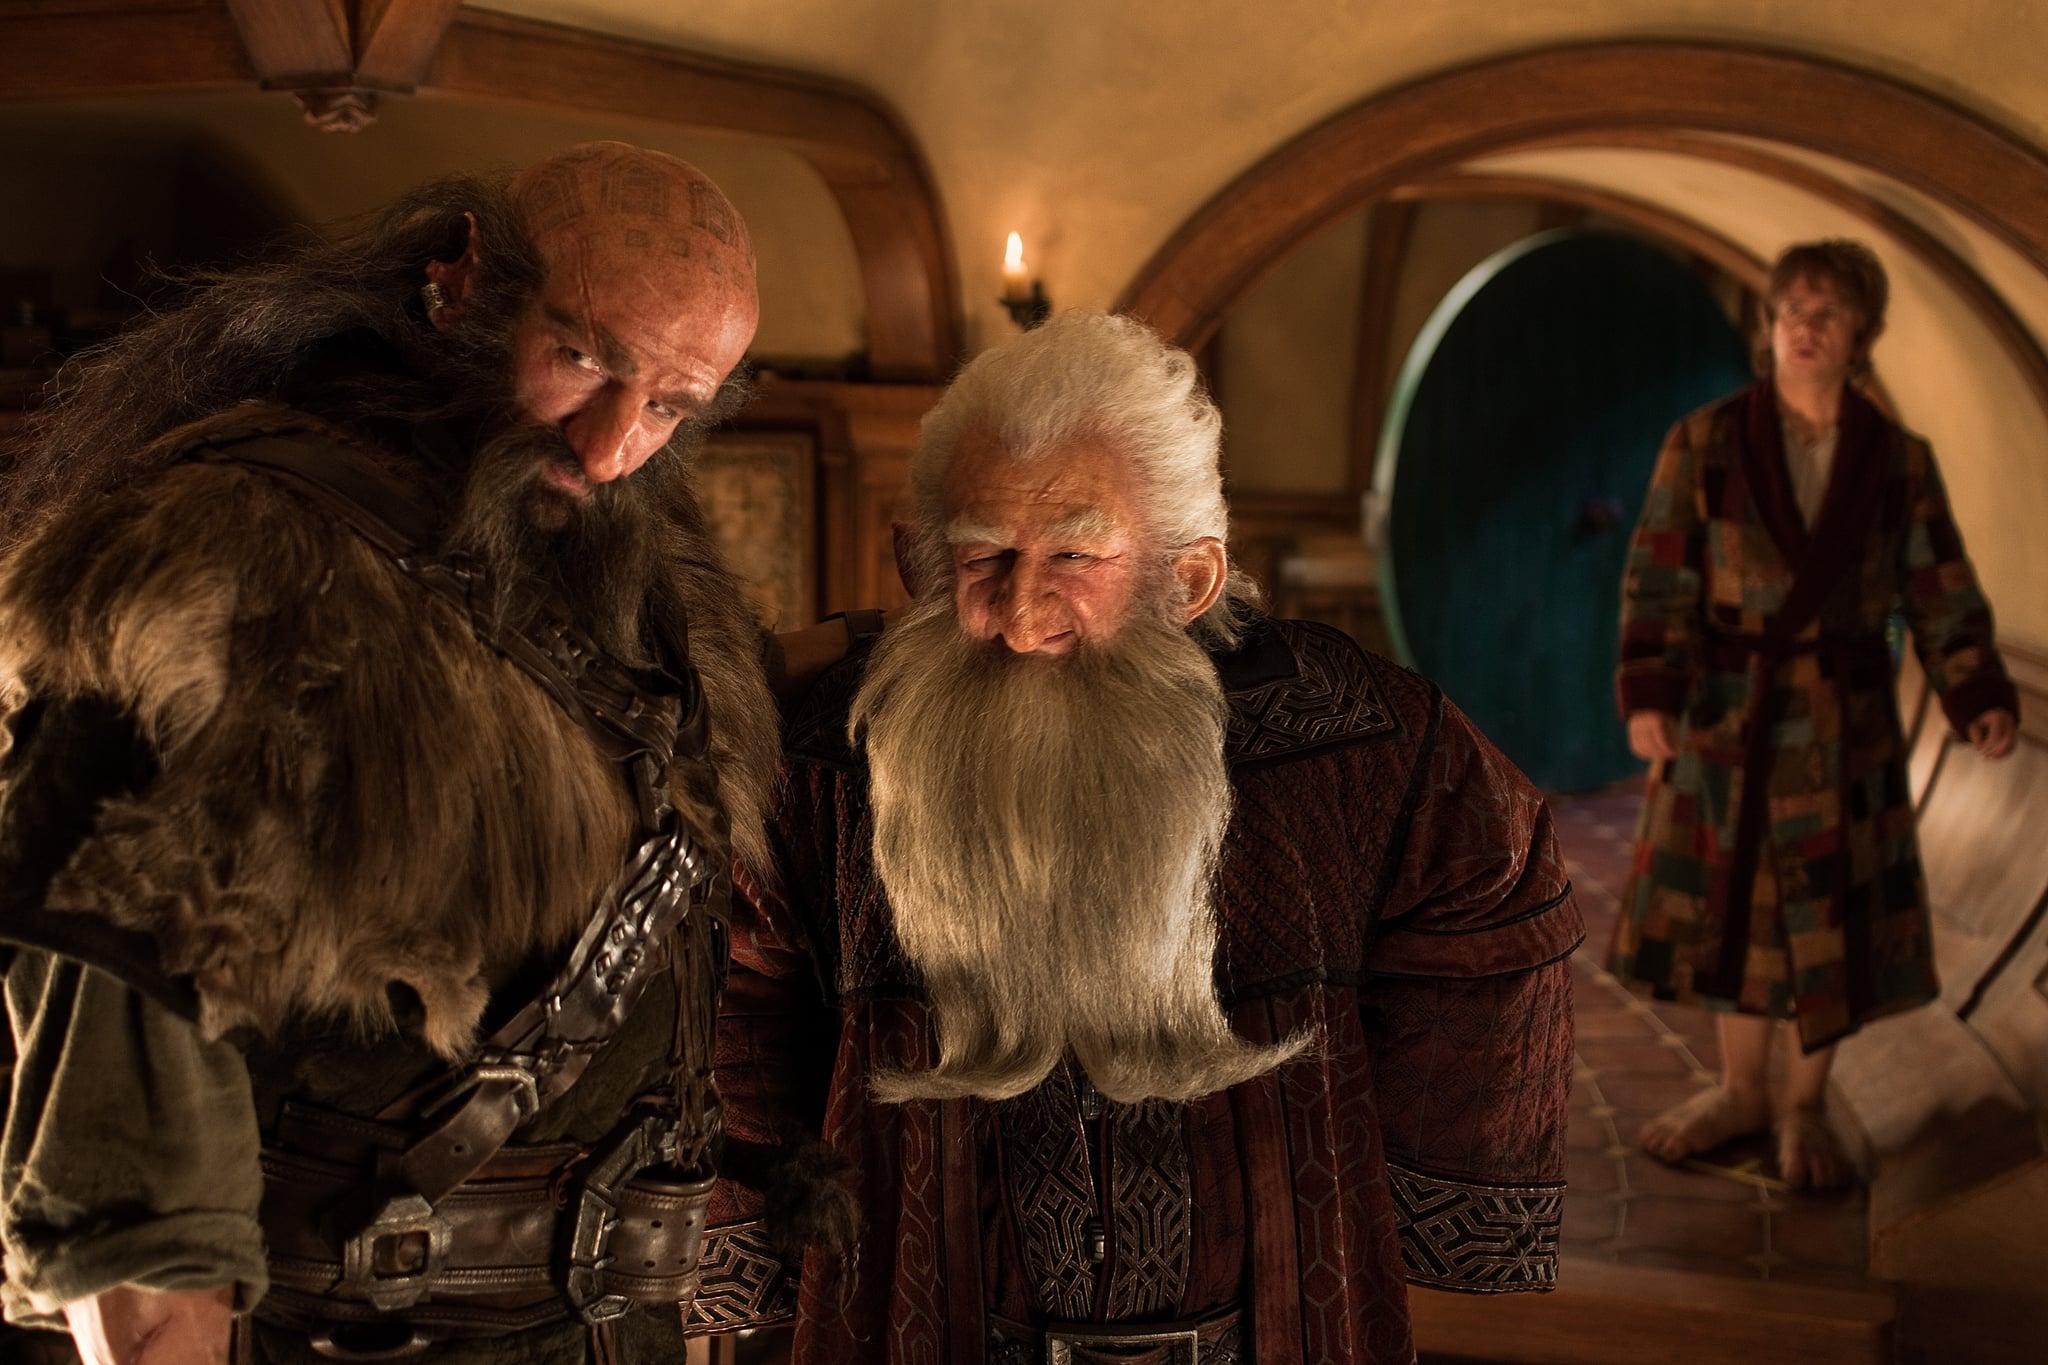 Streama Hobbit filmerna